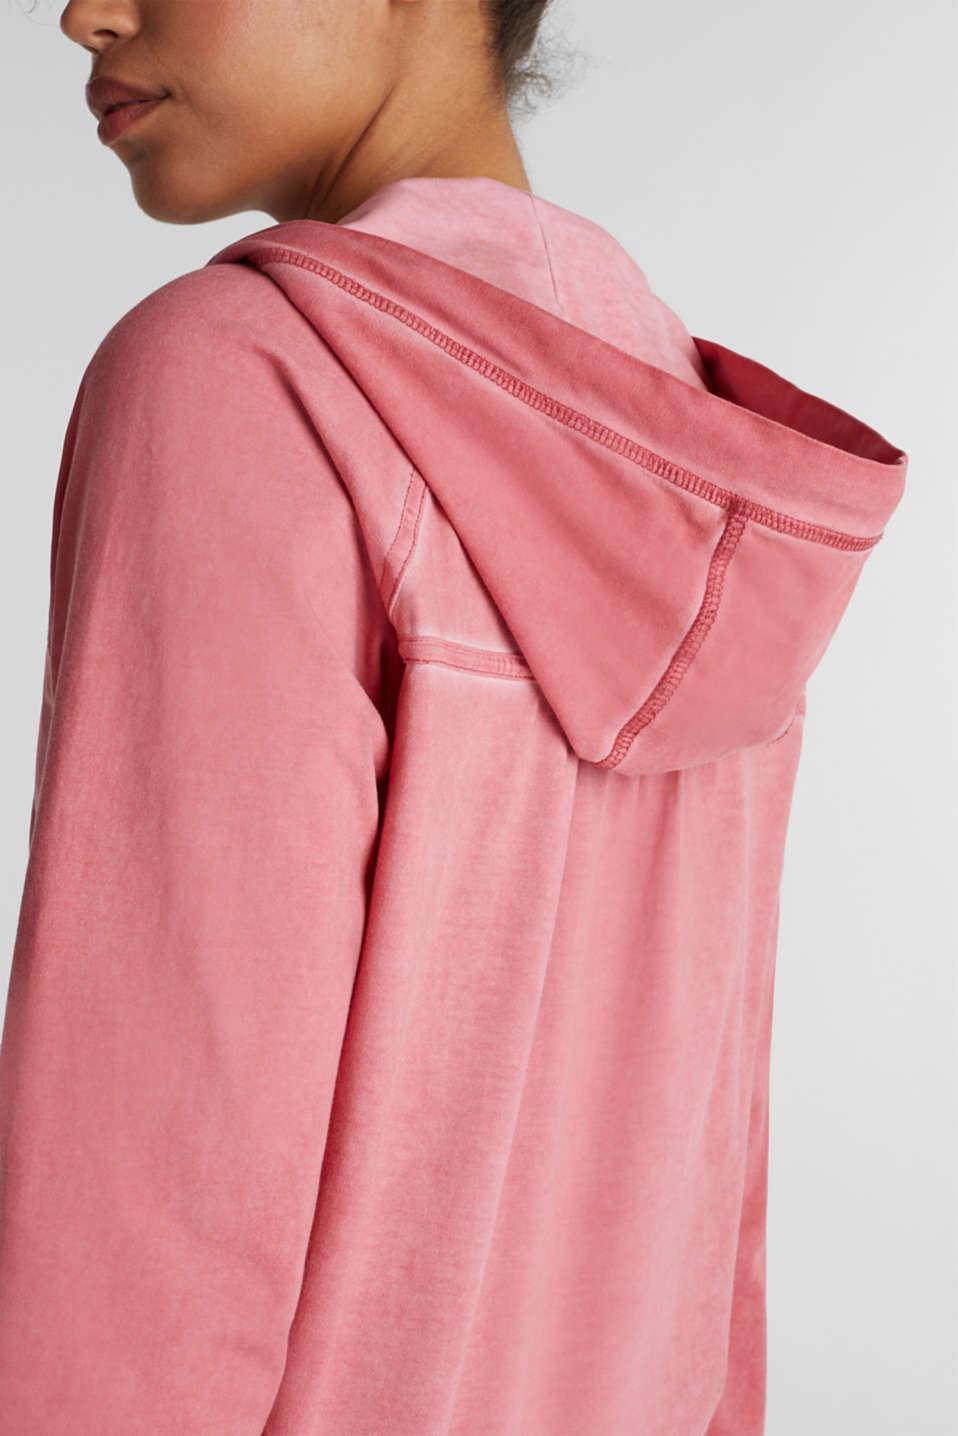 Vintage cardigan, stretch jersey, CORAL RED, detail image number 2